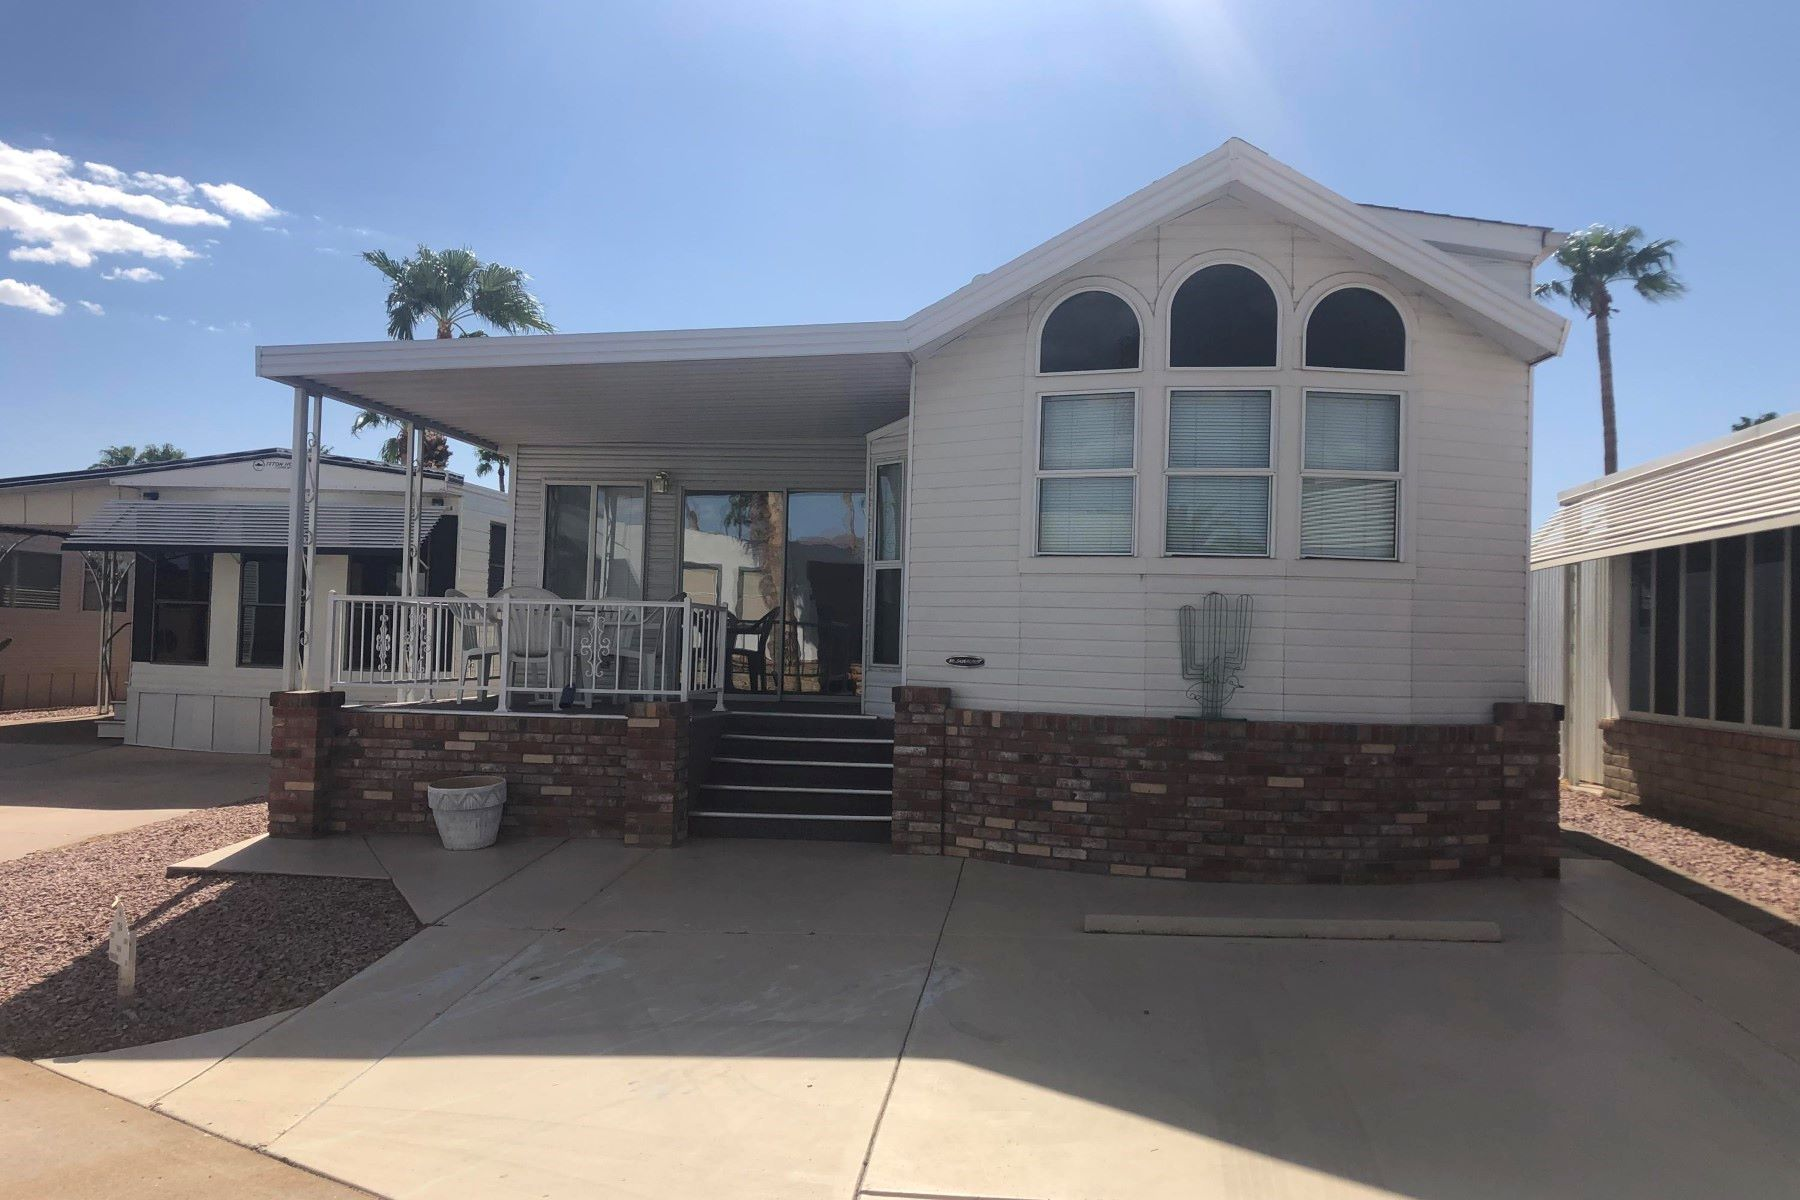 土地,用地 为 销售 在 Roadhaven Resort Of Apache Junction 194 S KIOWA CIR 507 阿帕奇枢纽, 亚利桑那州 85119 美国